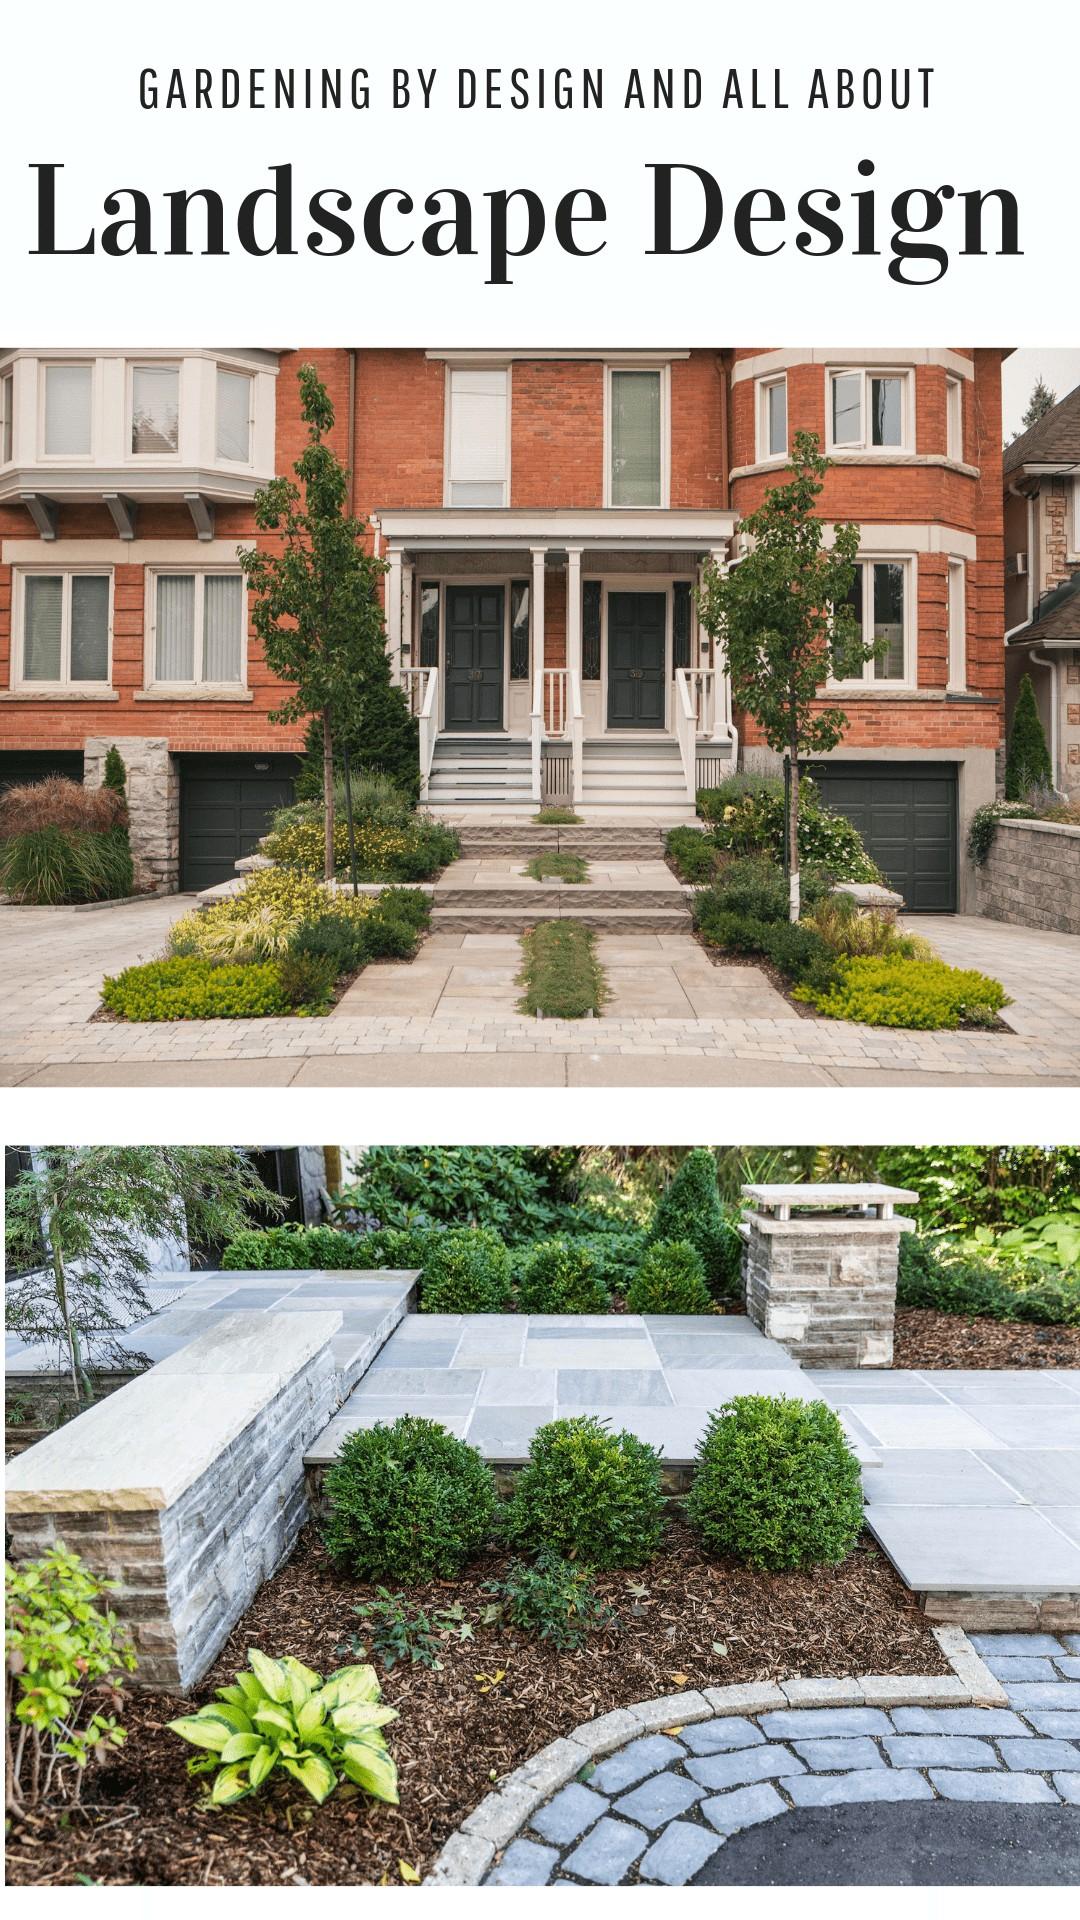 Landscape Design with Gardening by Design